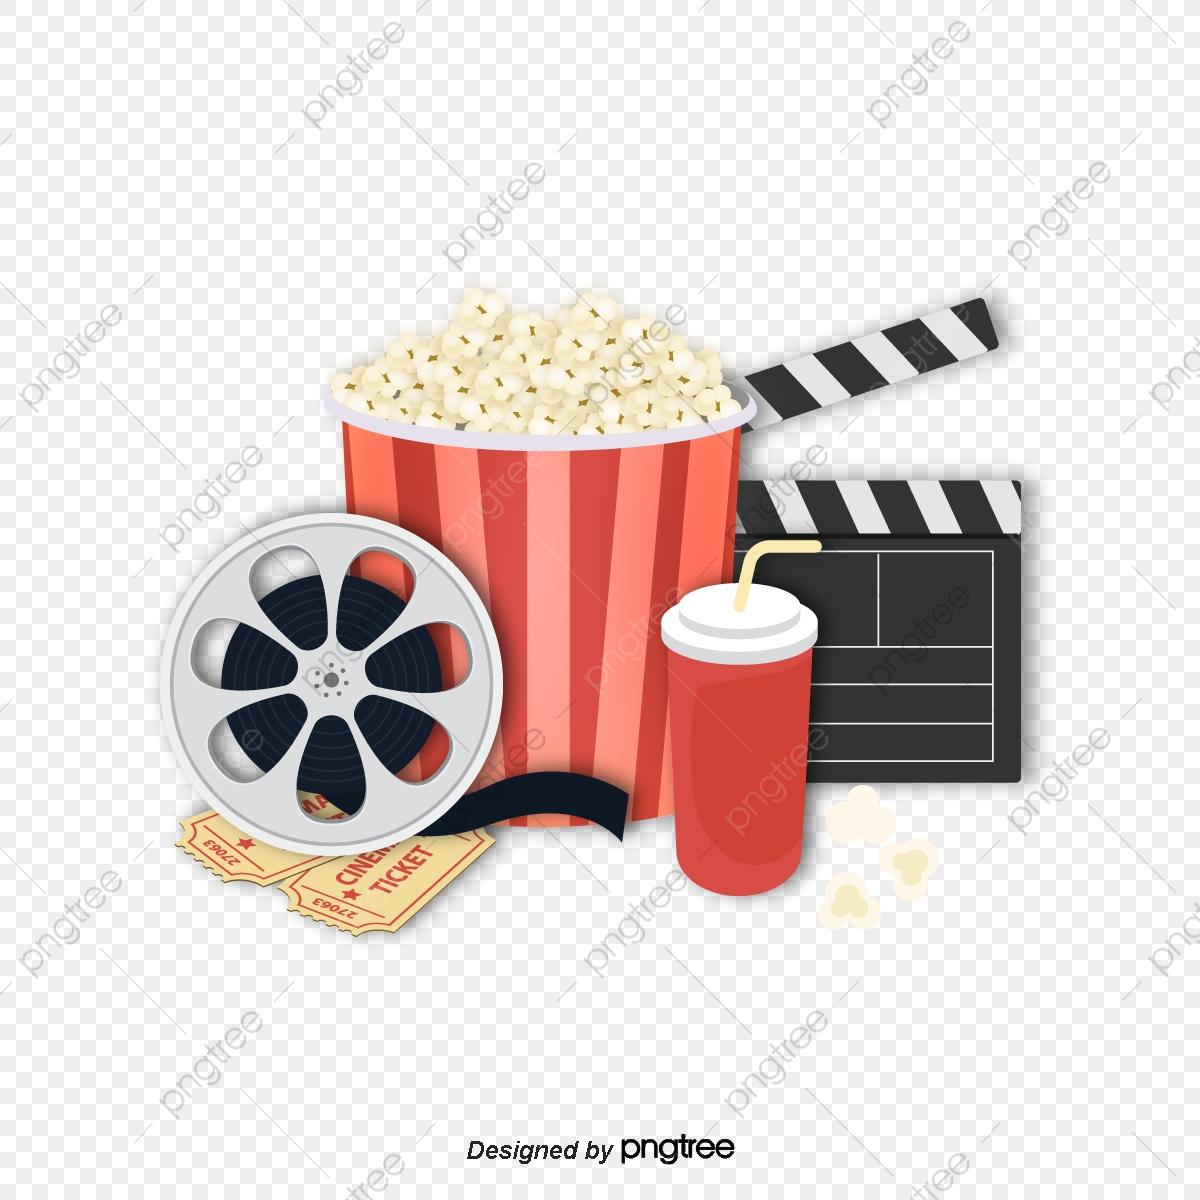 Cinema Popcorn Vector Png, Vector Popcorn, Gourmet Popcorn, Cinema.